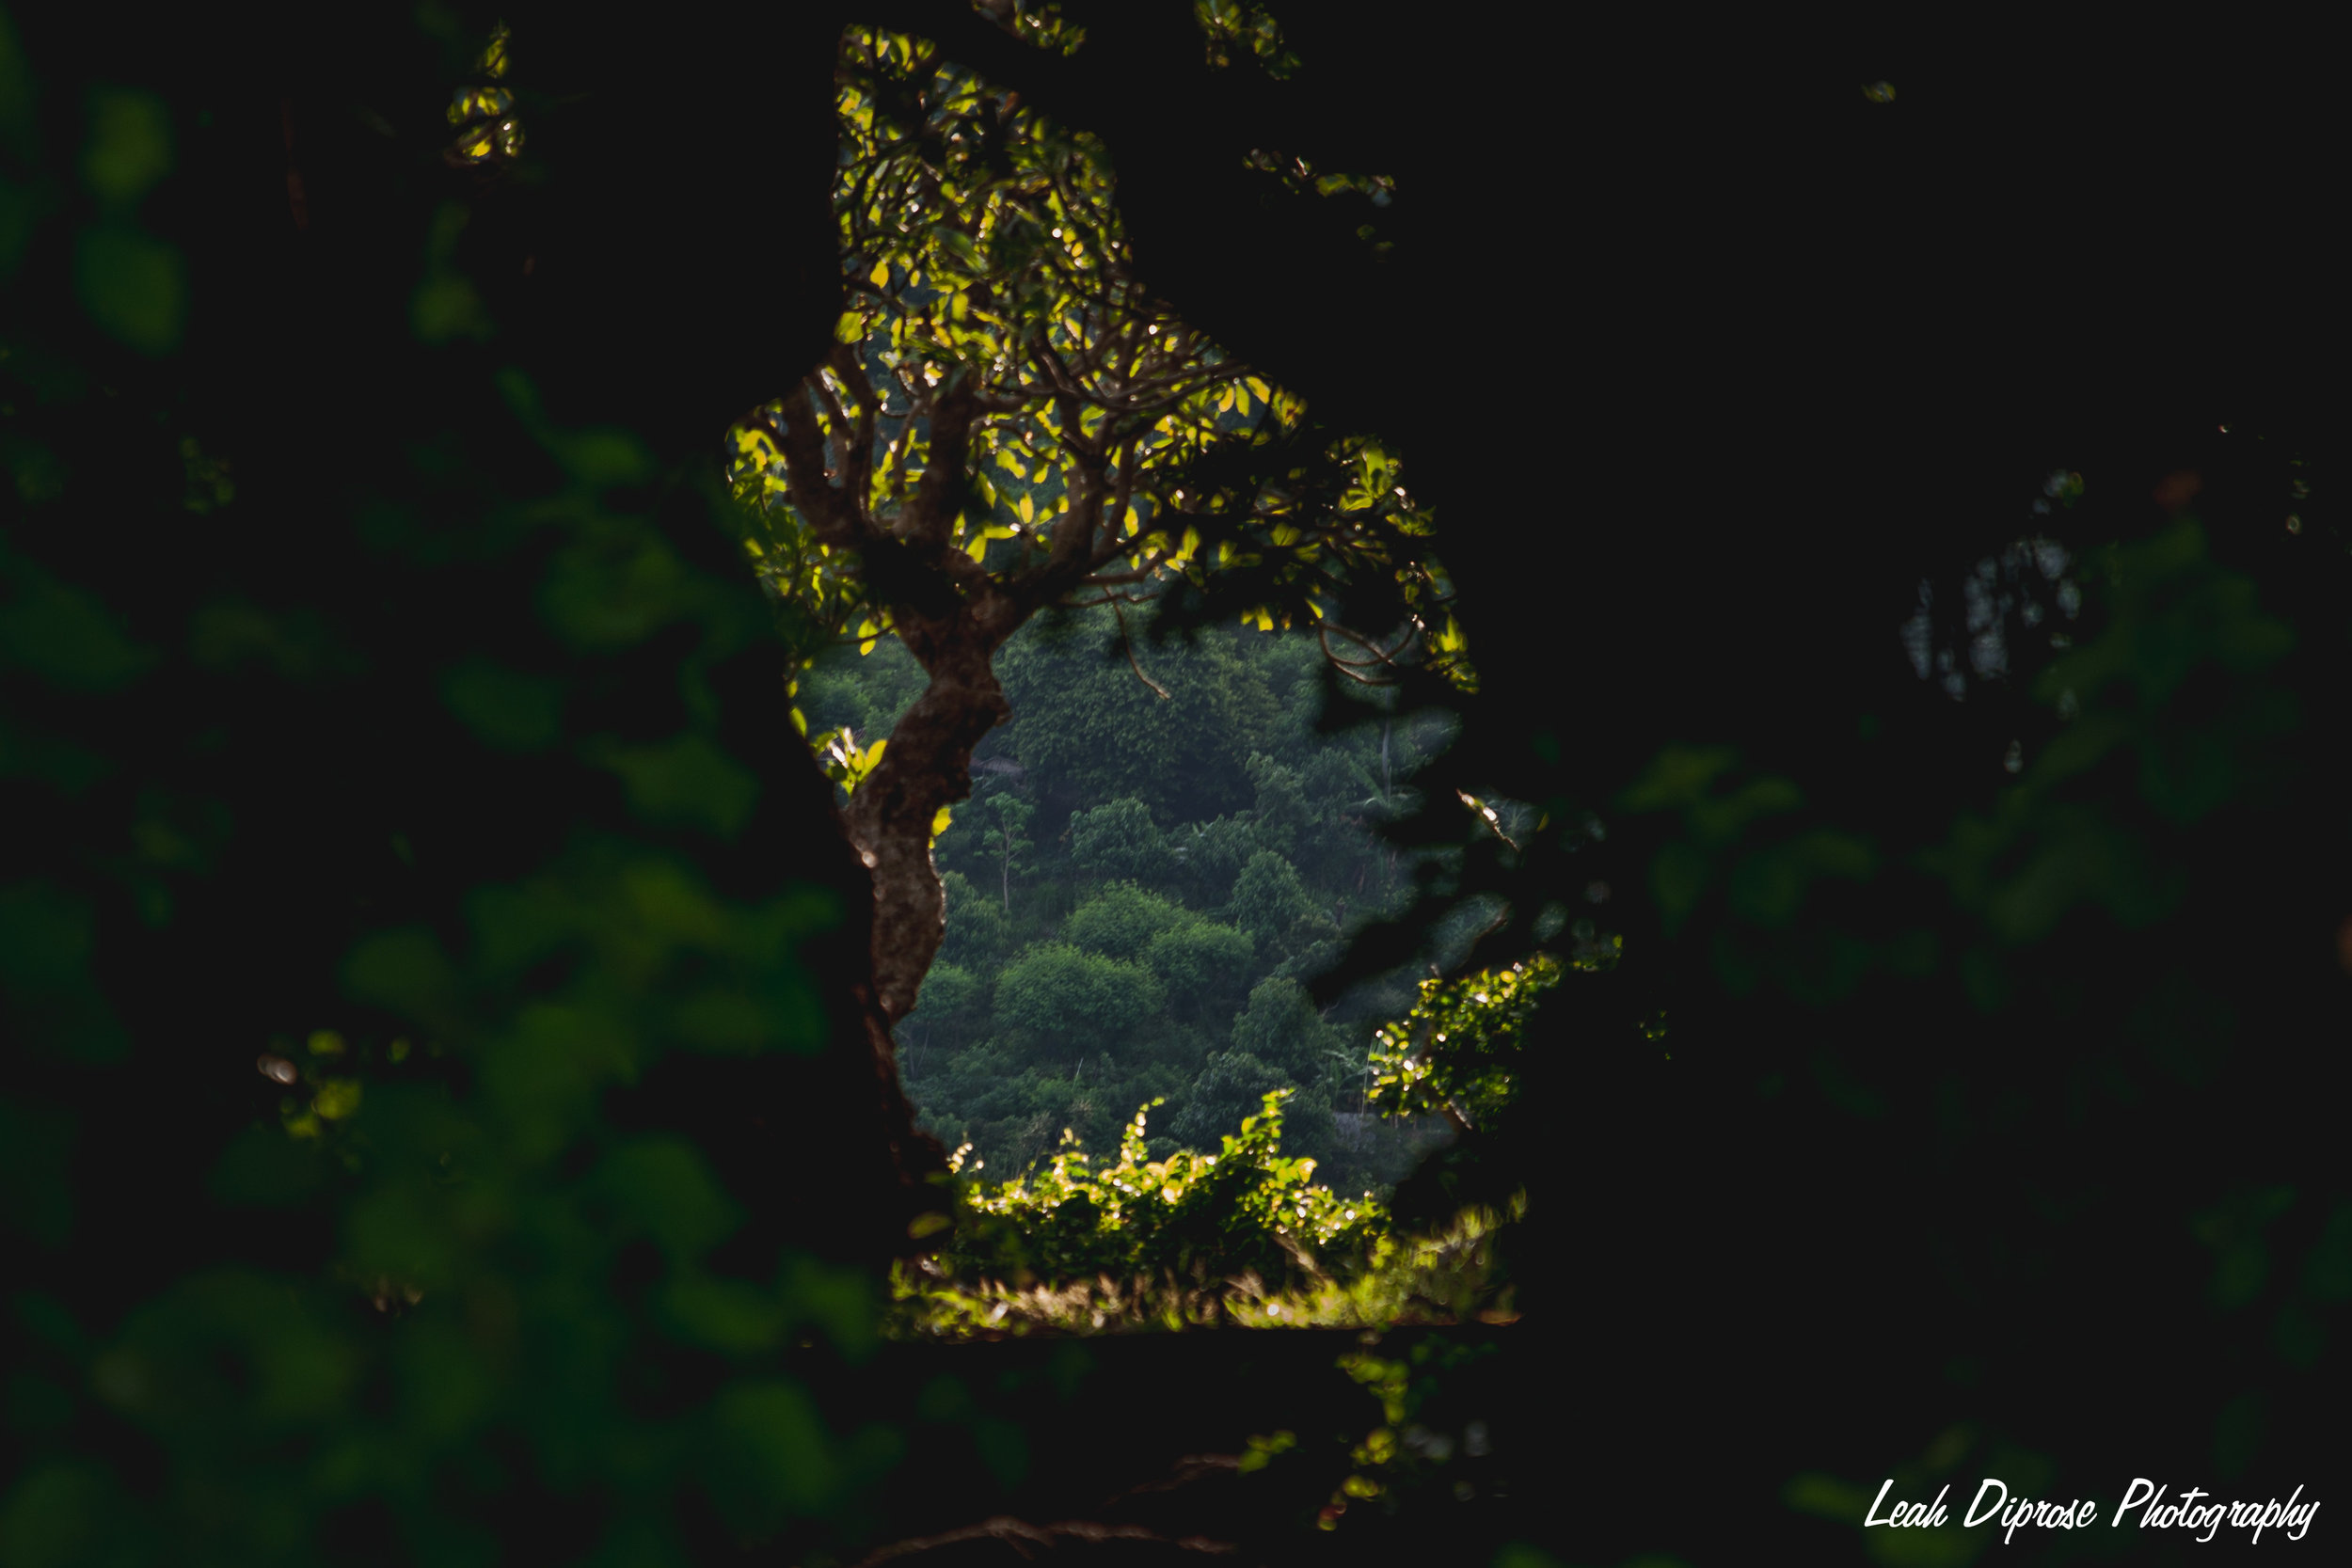 Leah Diprose Photography image-7099.jpg